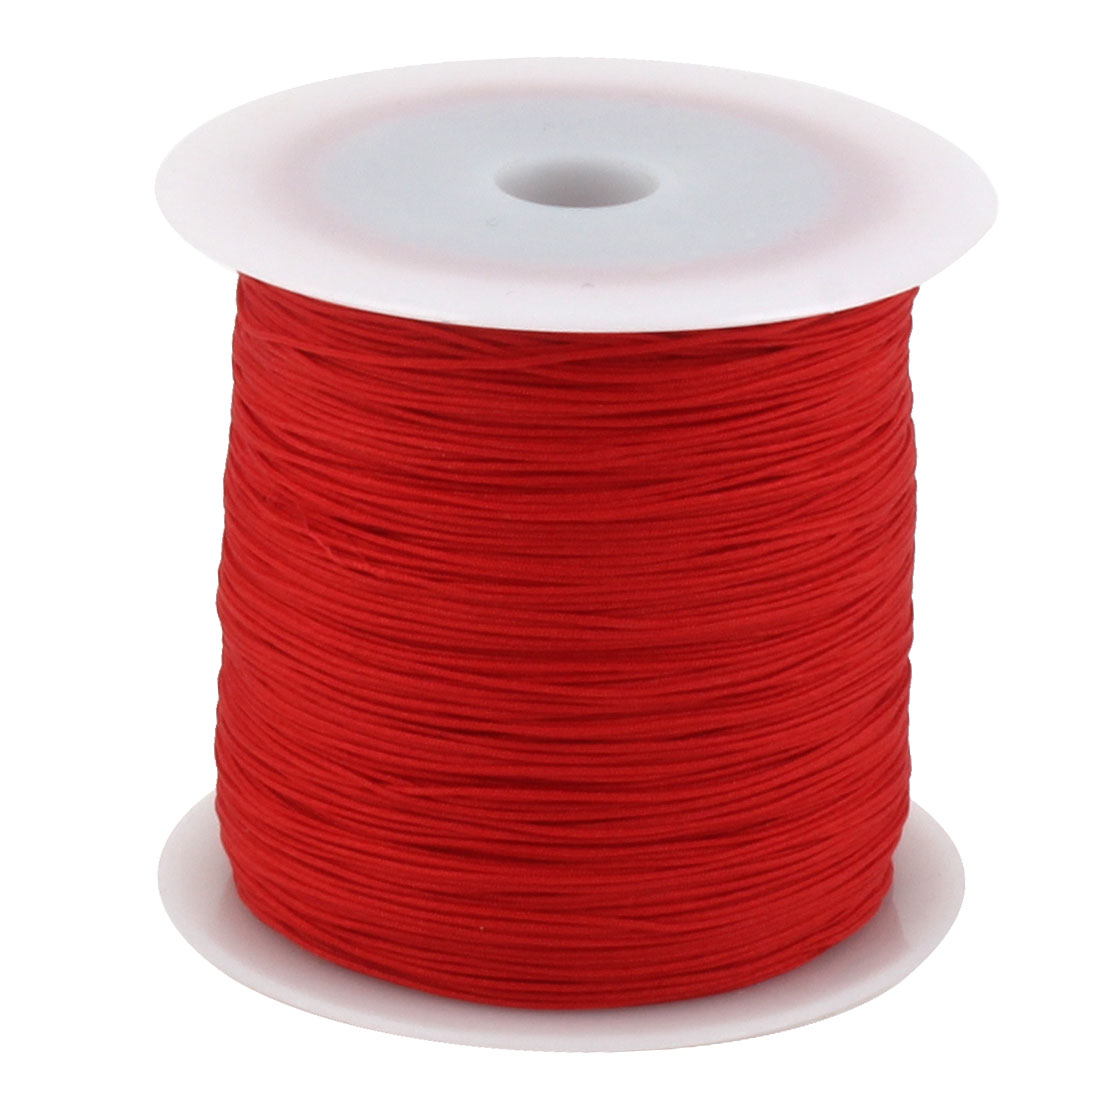 Family Nylon DIY Craft Art Braided Beading Cord String Rope Roll Red 110 Yards